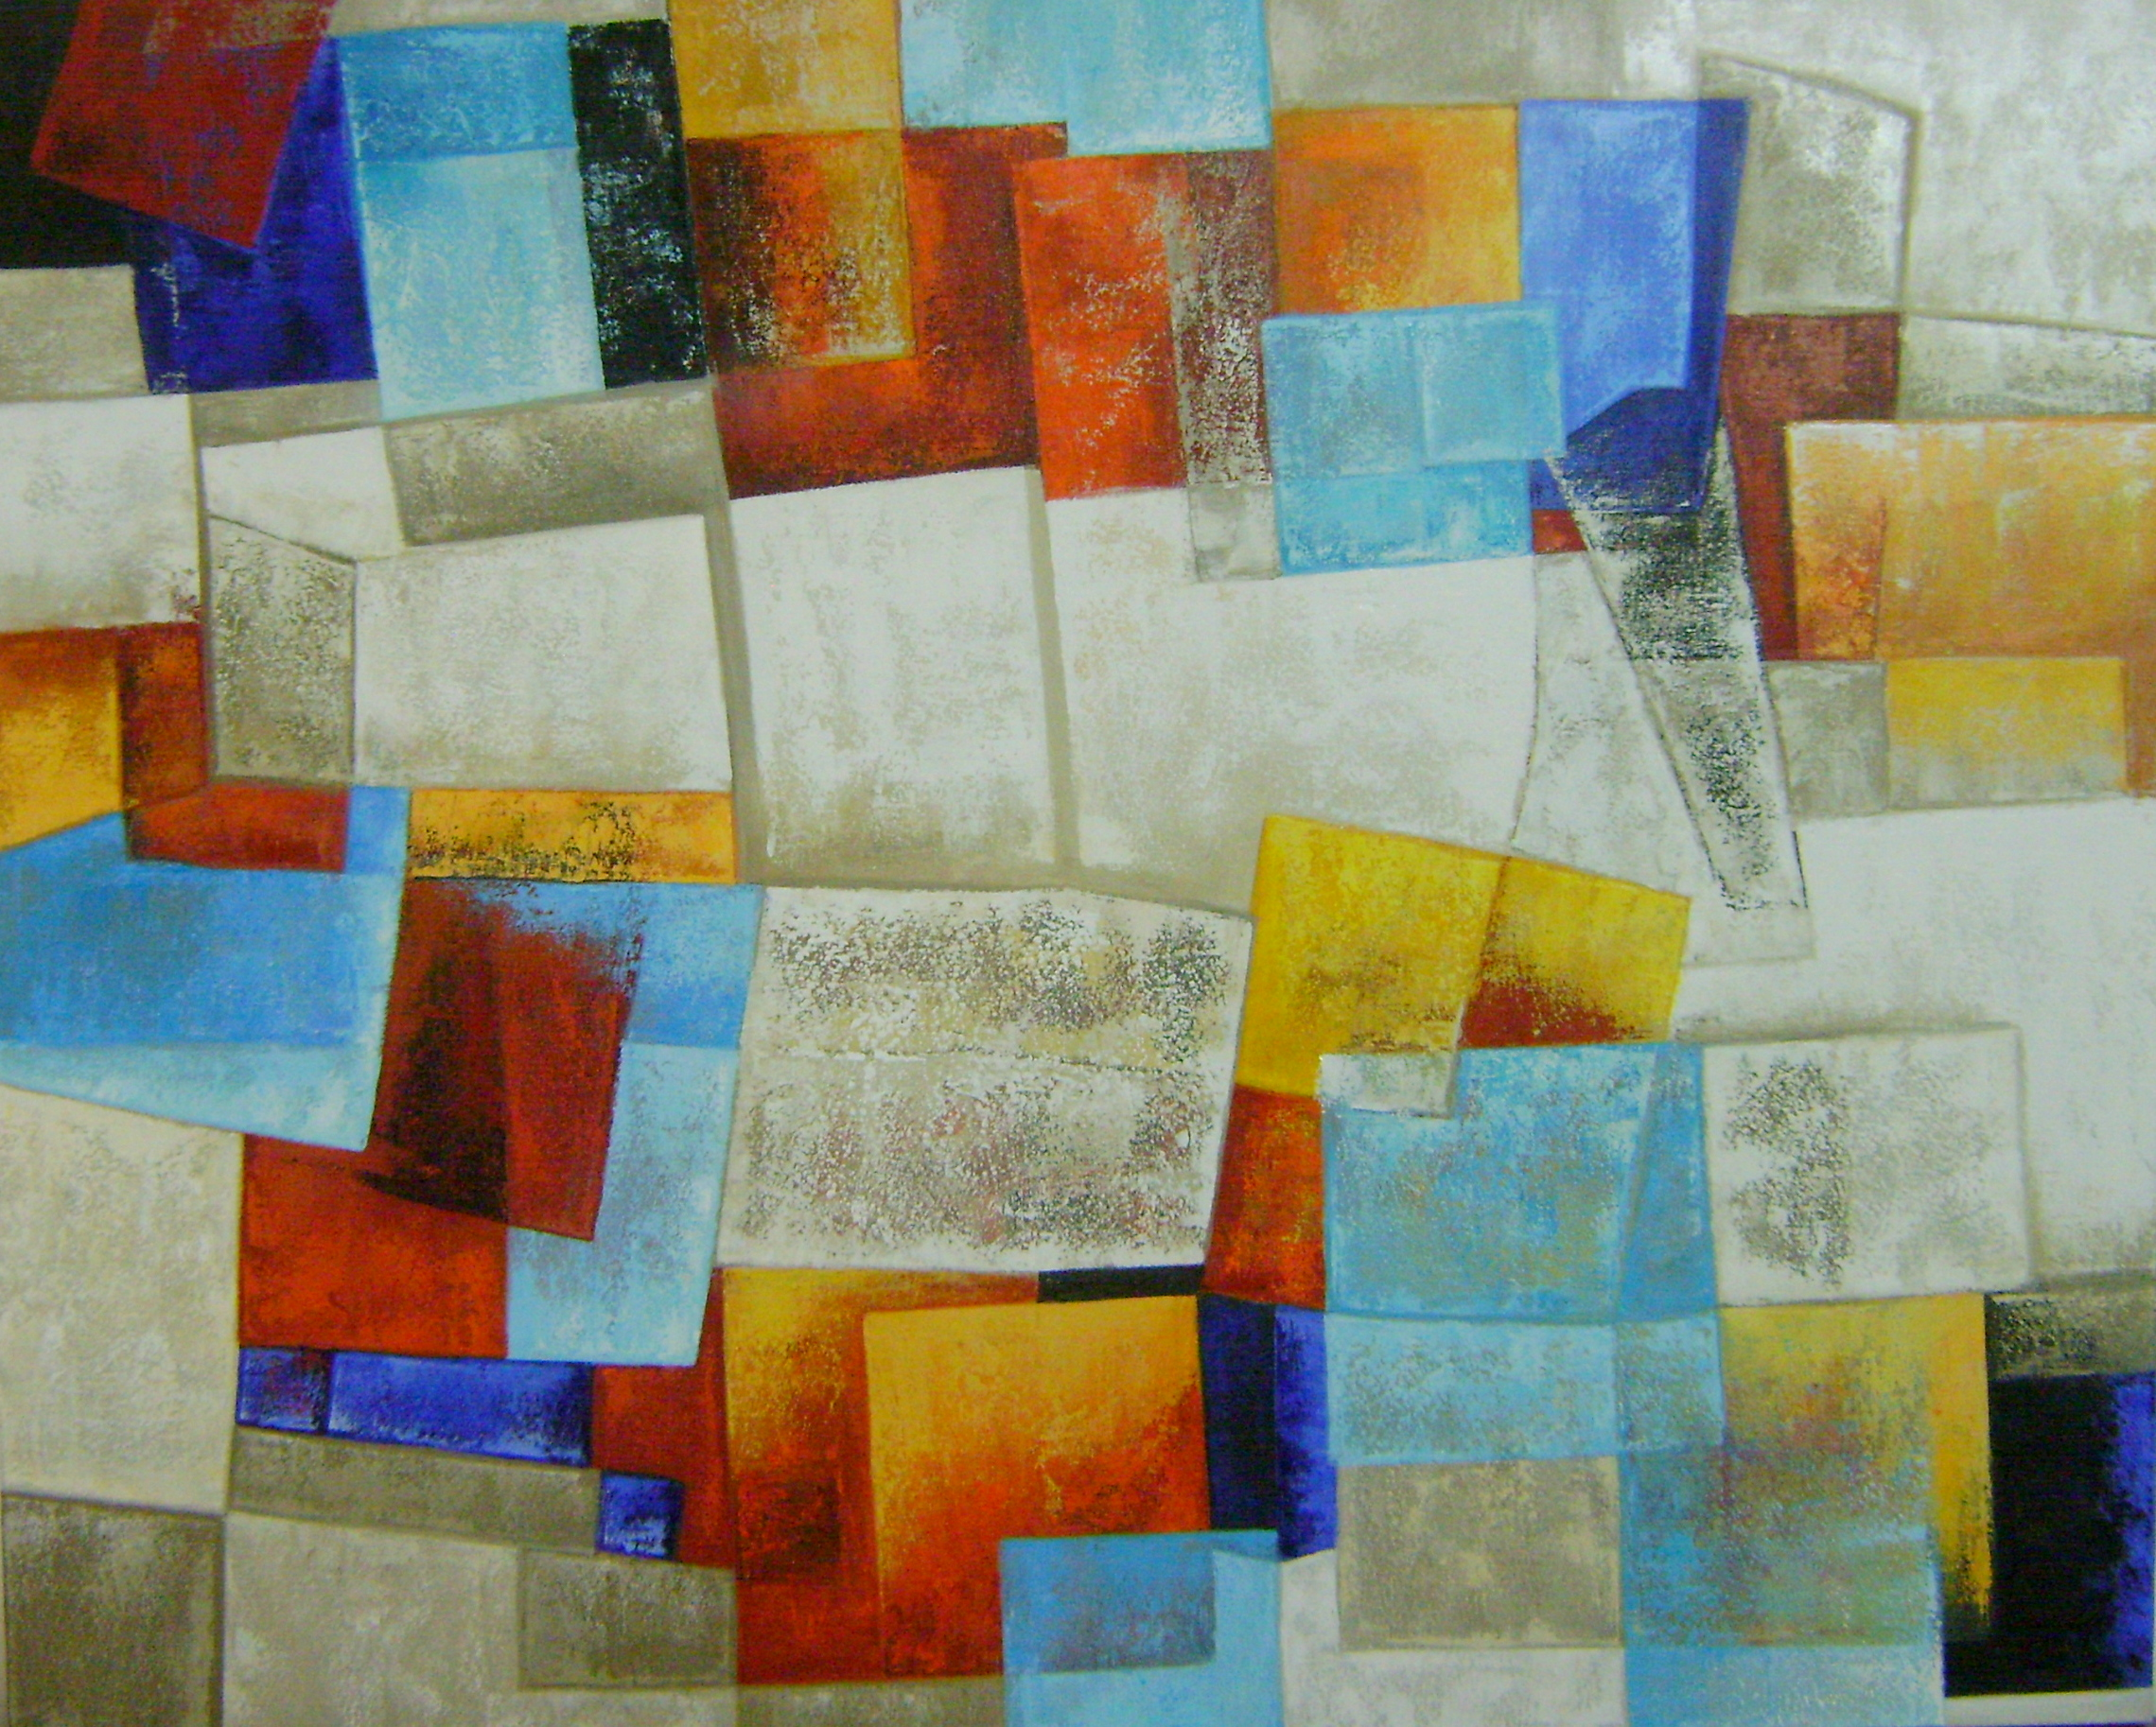 Pinturas de telas abstratas